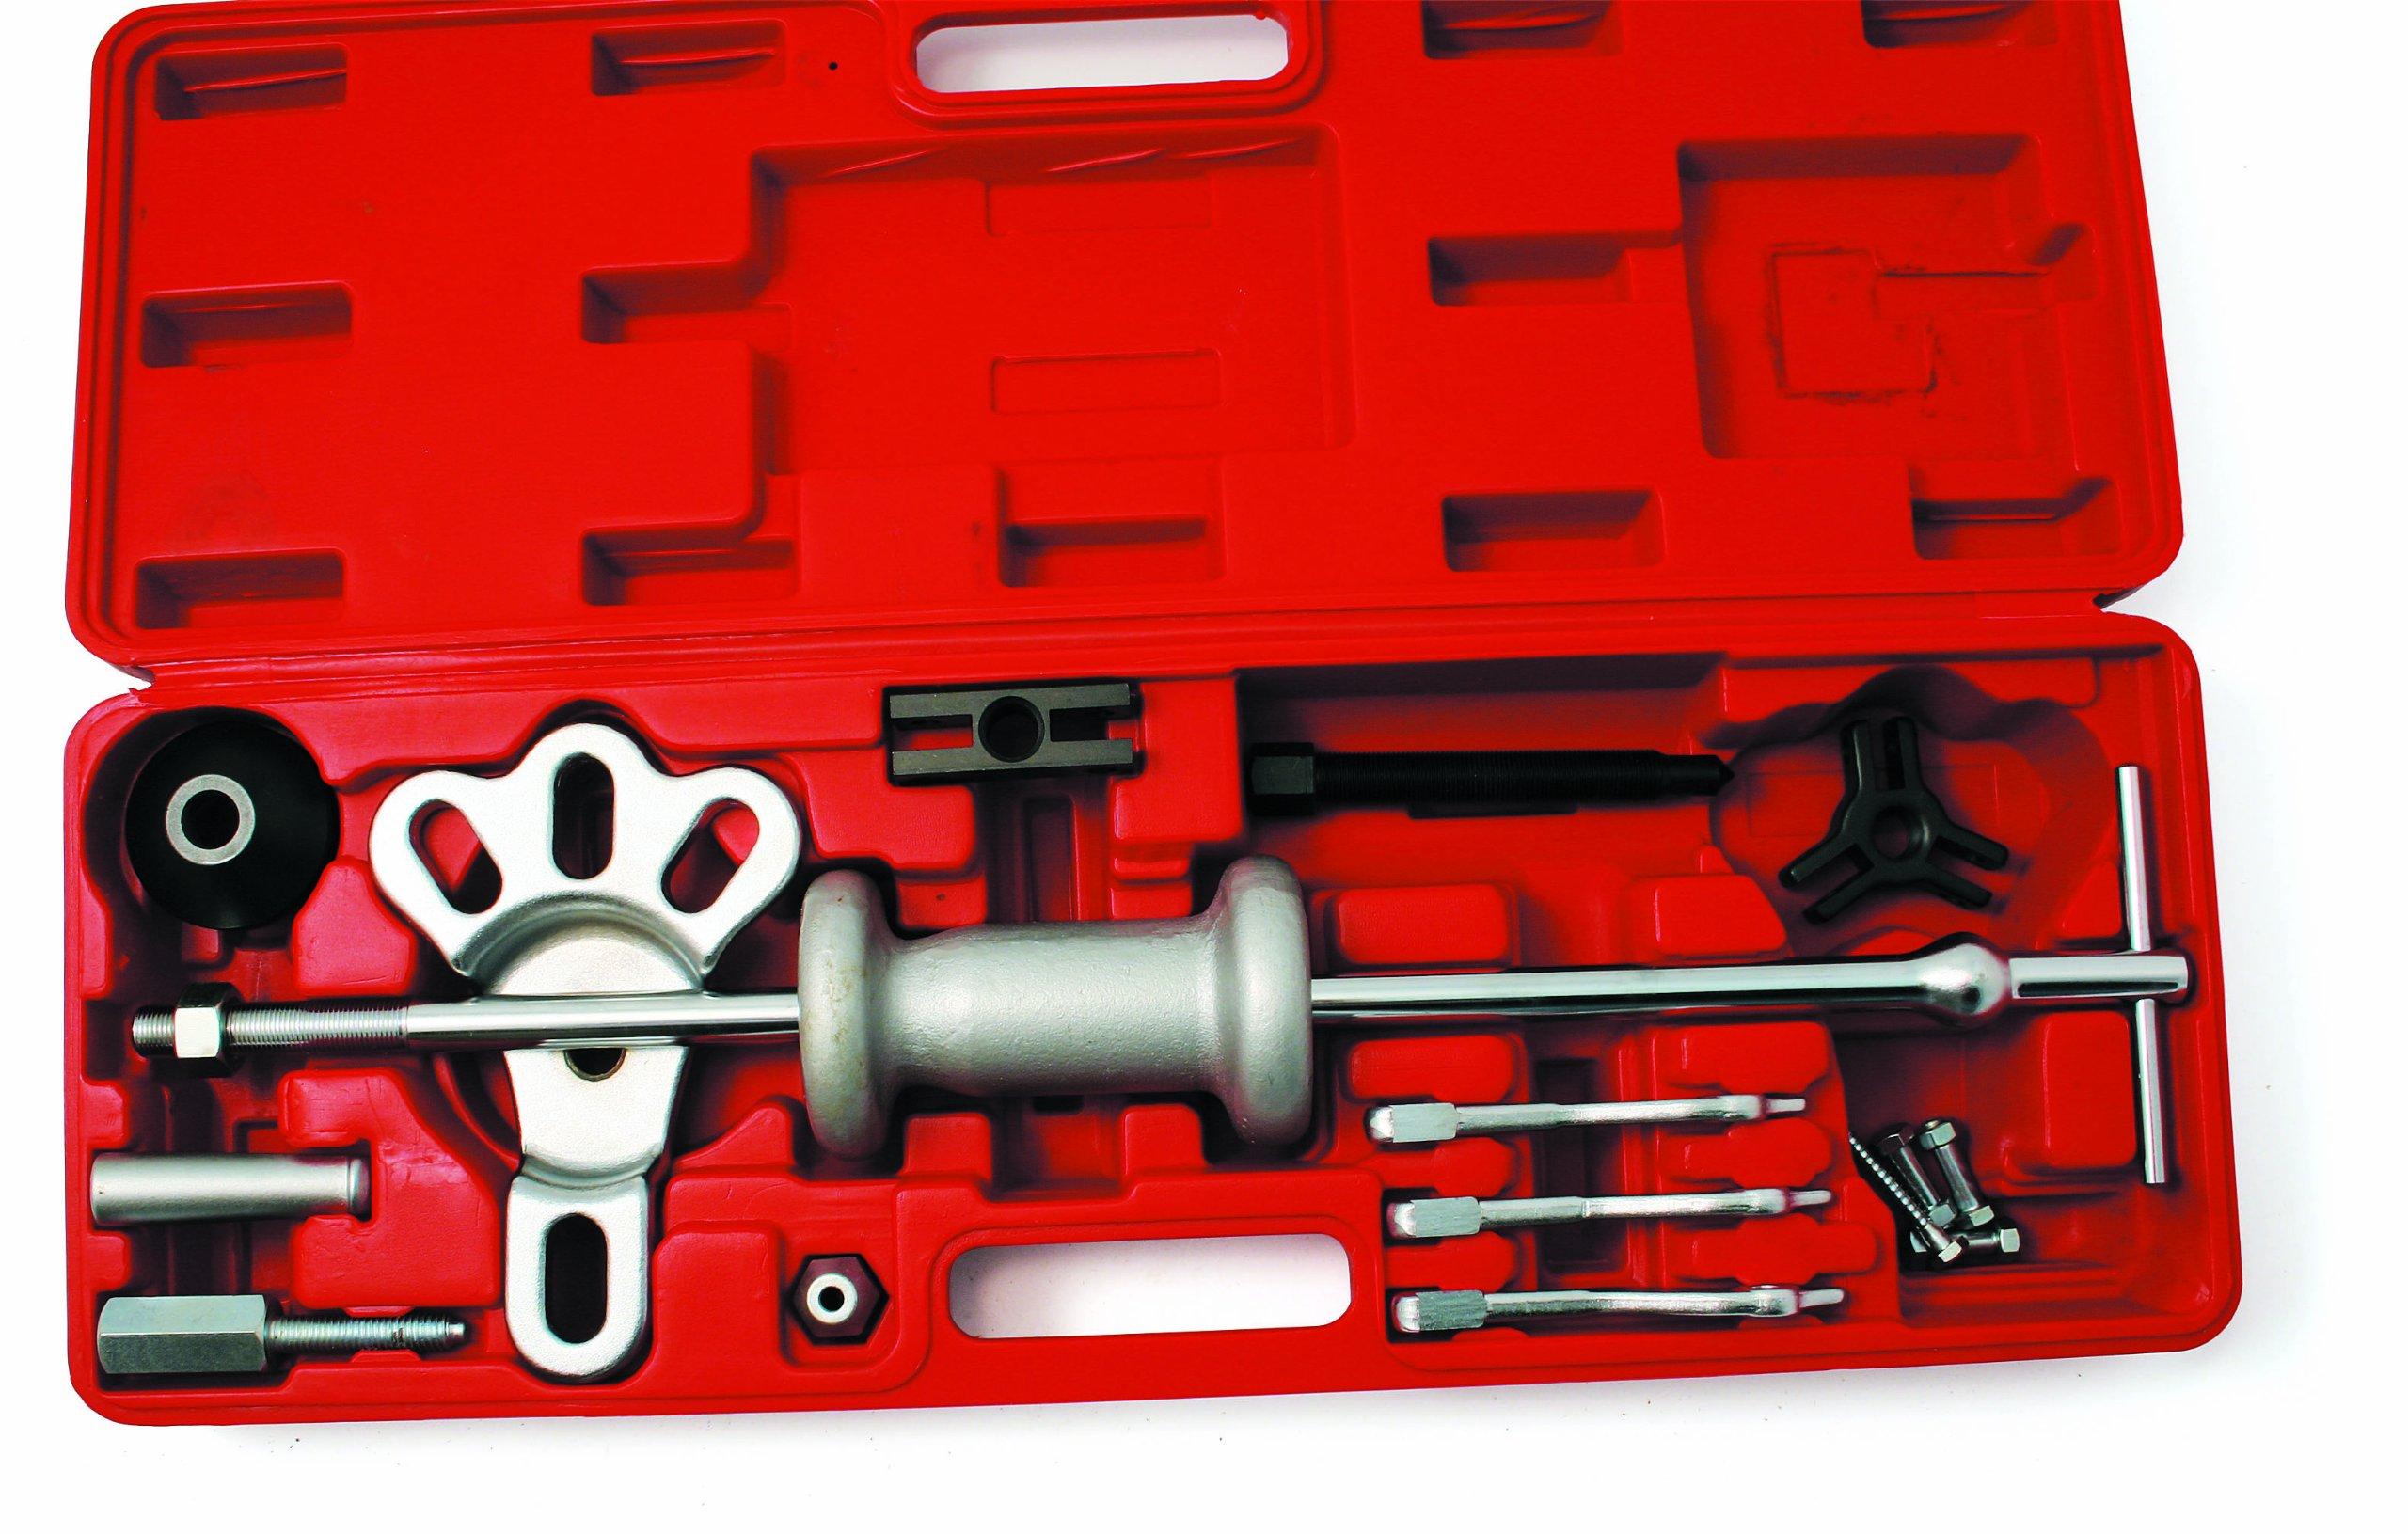 CTA Tools A490 Slide Hammer Puller Set by CTA Tools (Image #1)